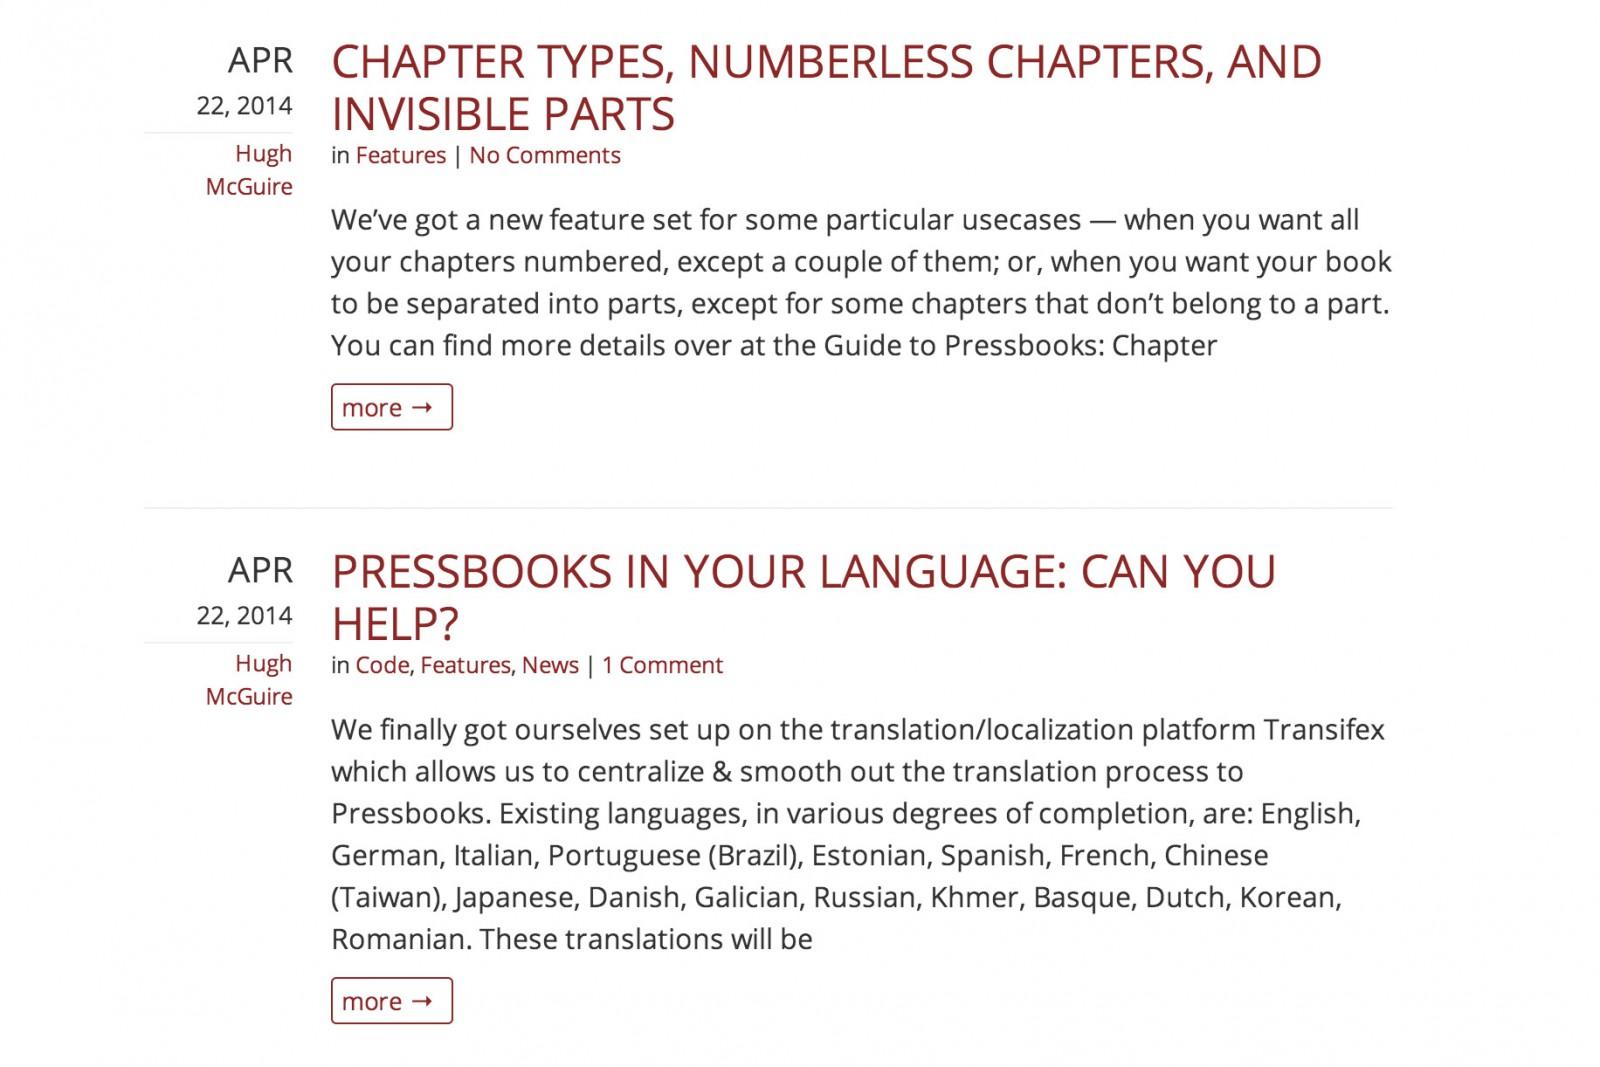 PressBooks site details